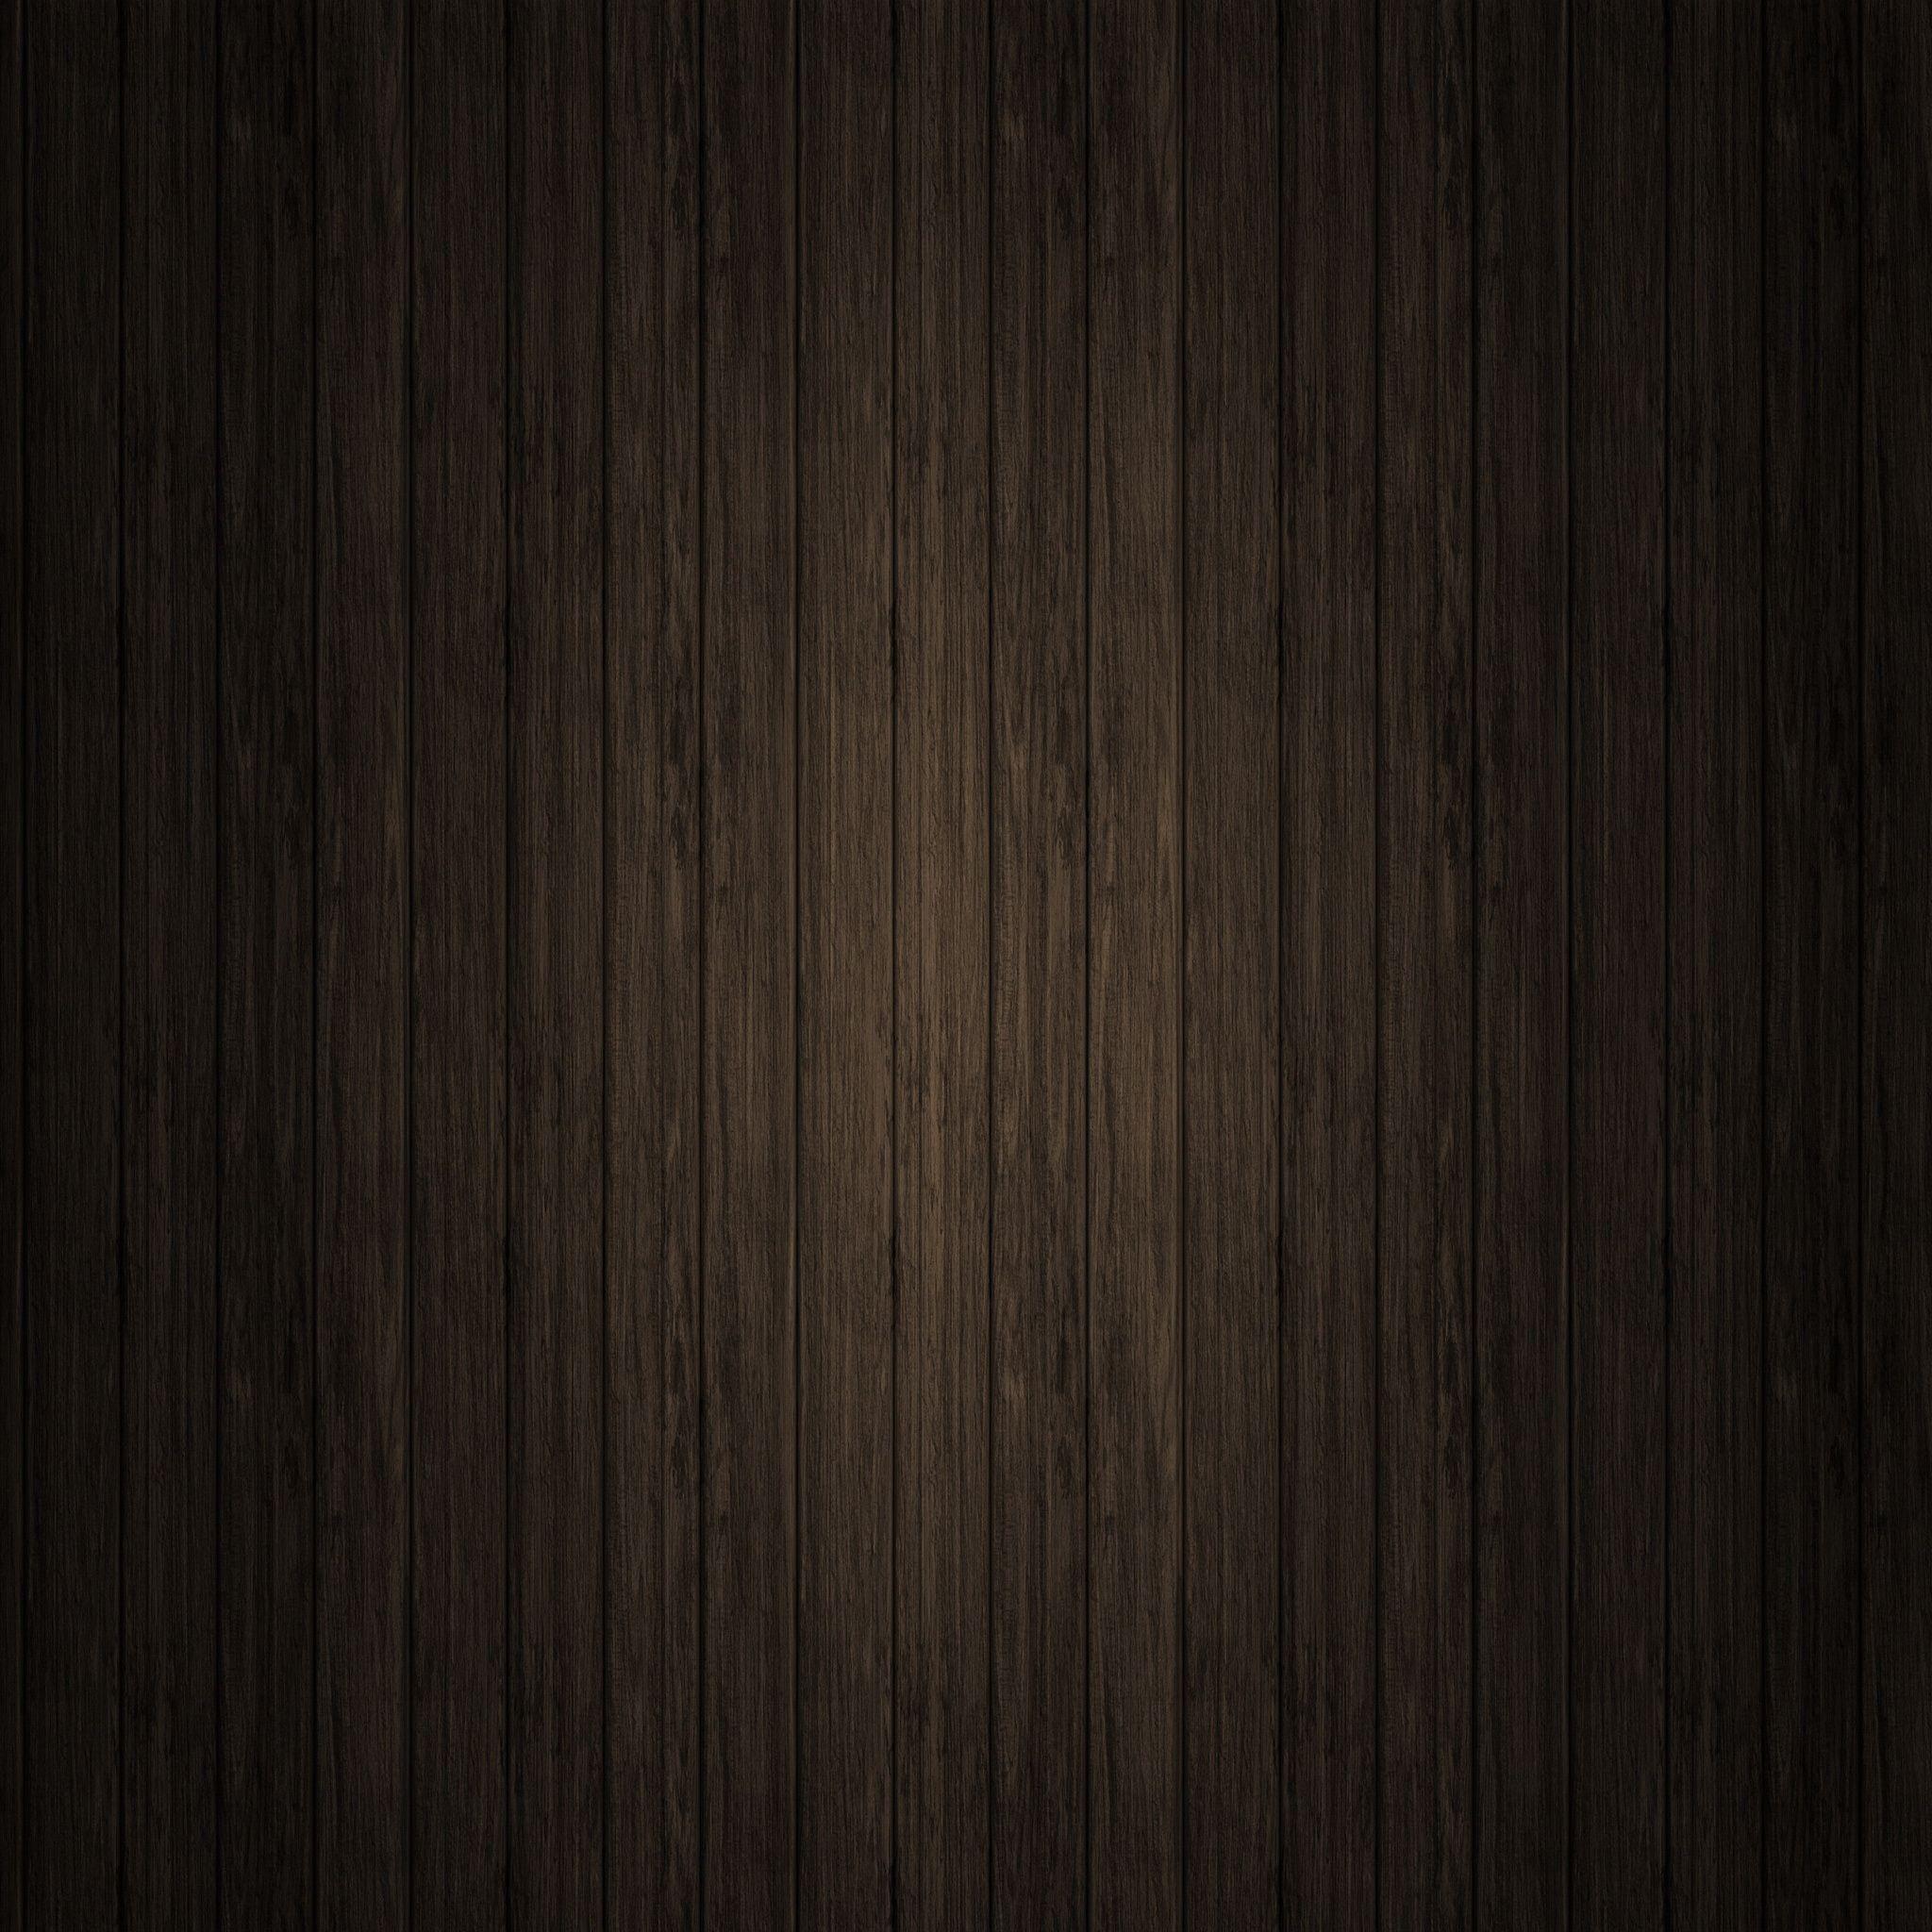 ipad-retina-wallpaper-2048x2048-0181 (2048×2048) | background